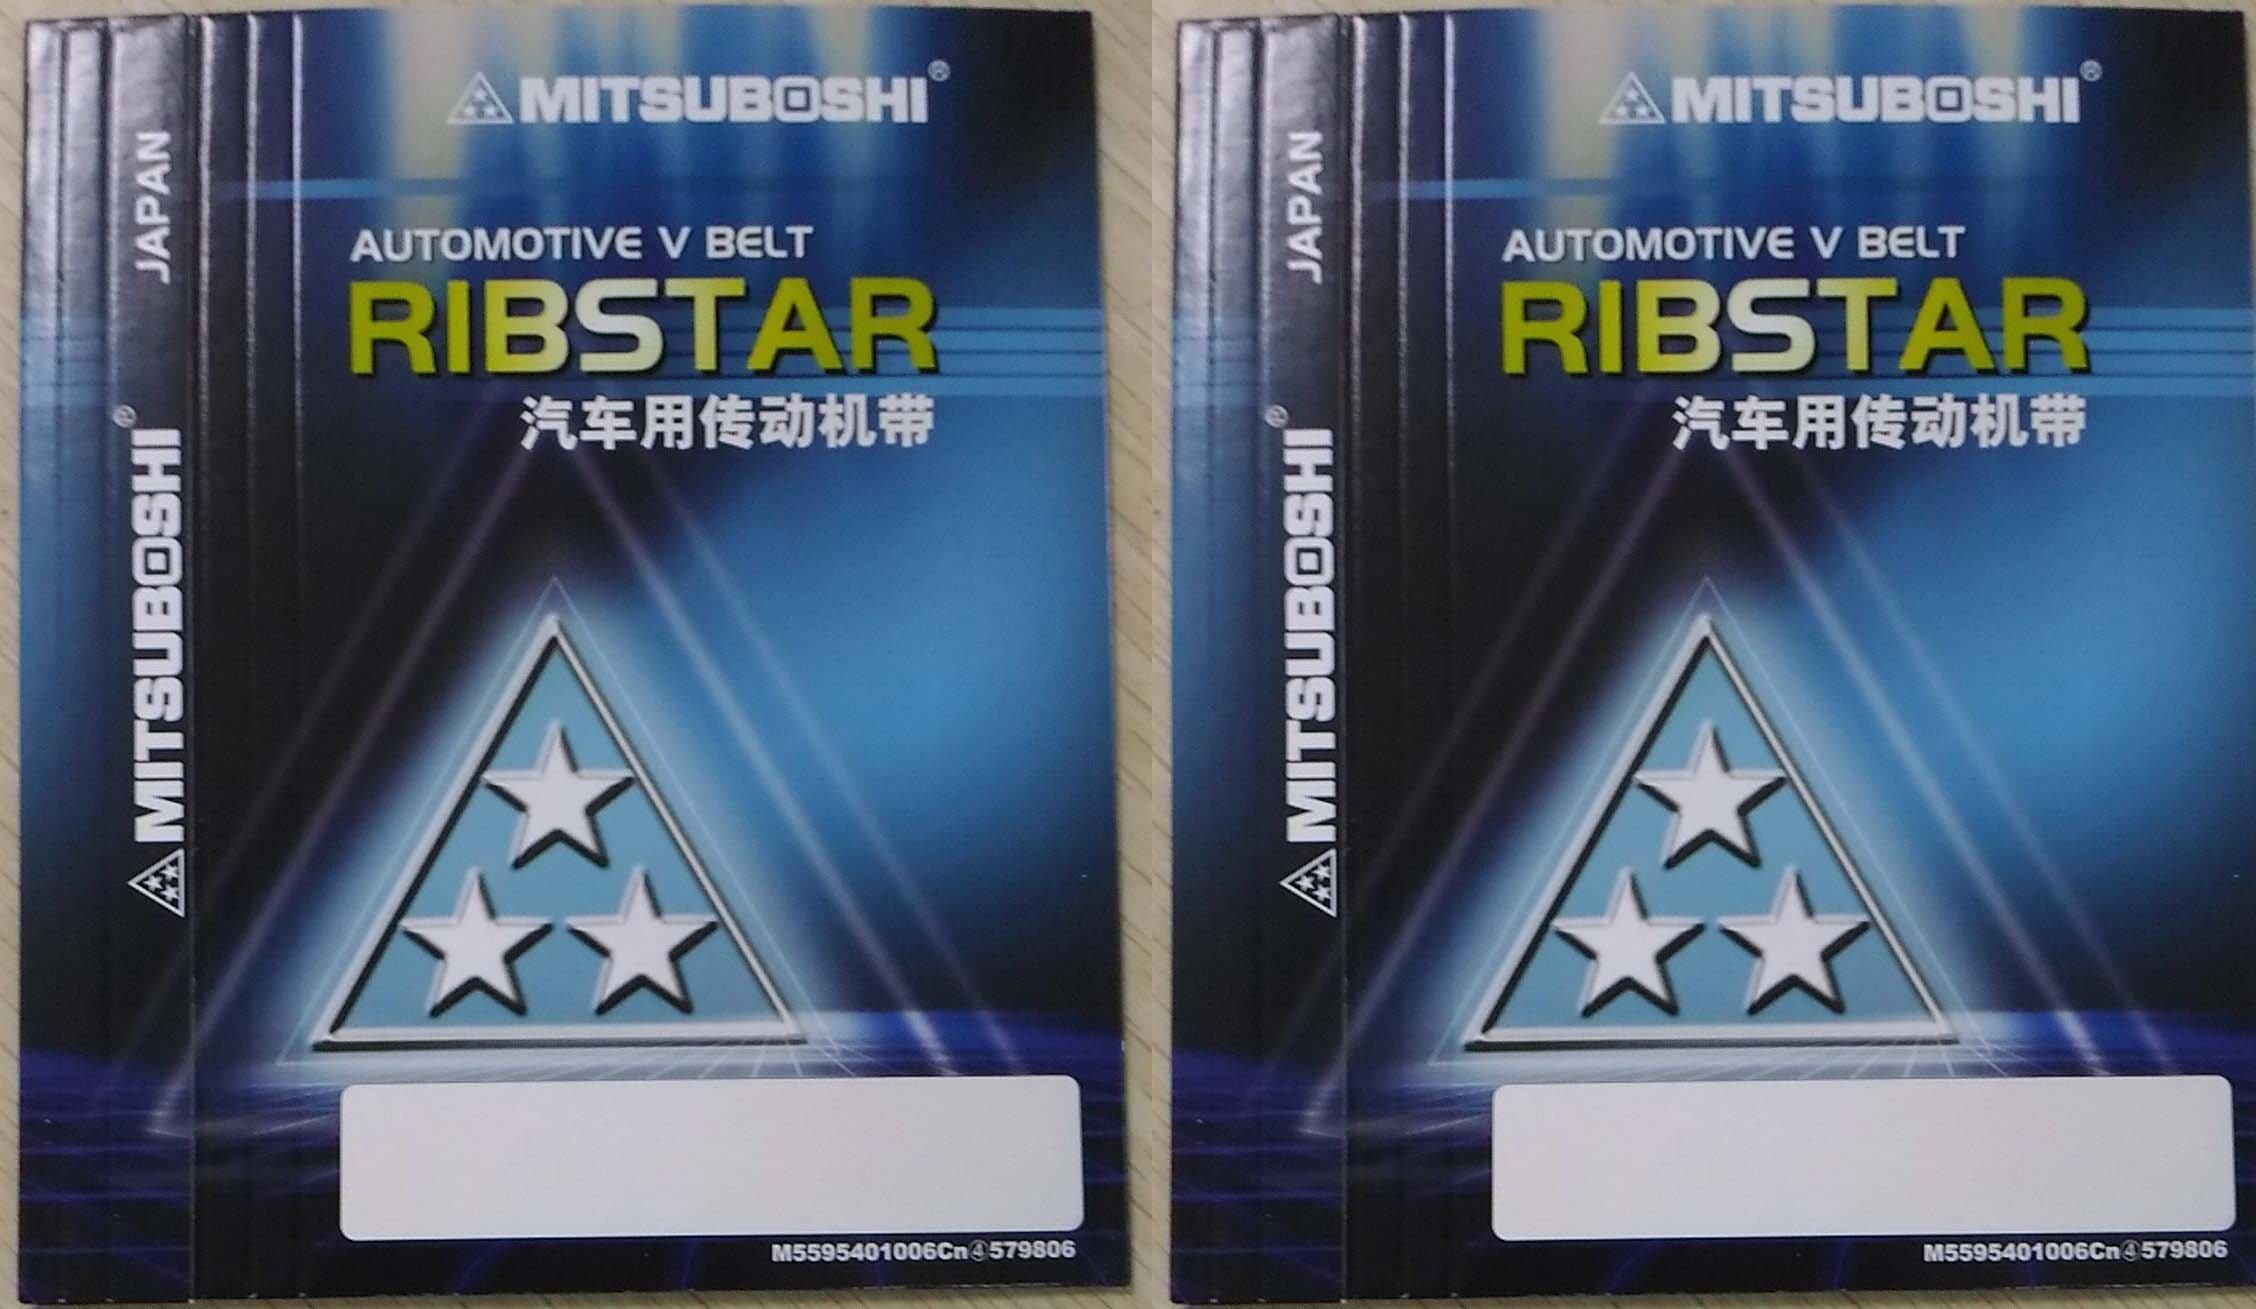 RECMF8465香港代購日本三星原廠正品汽車皮帶 MITSUBOSHI SUMITOMO住友280工程機械 空調皮帶